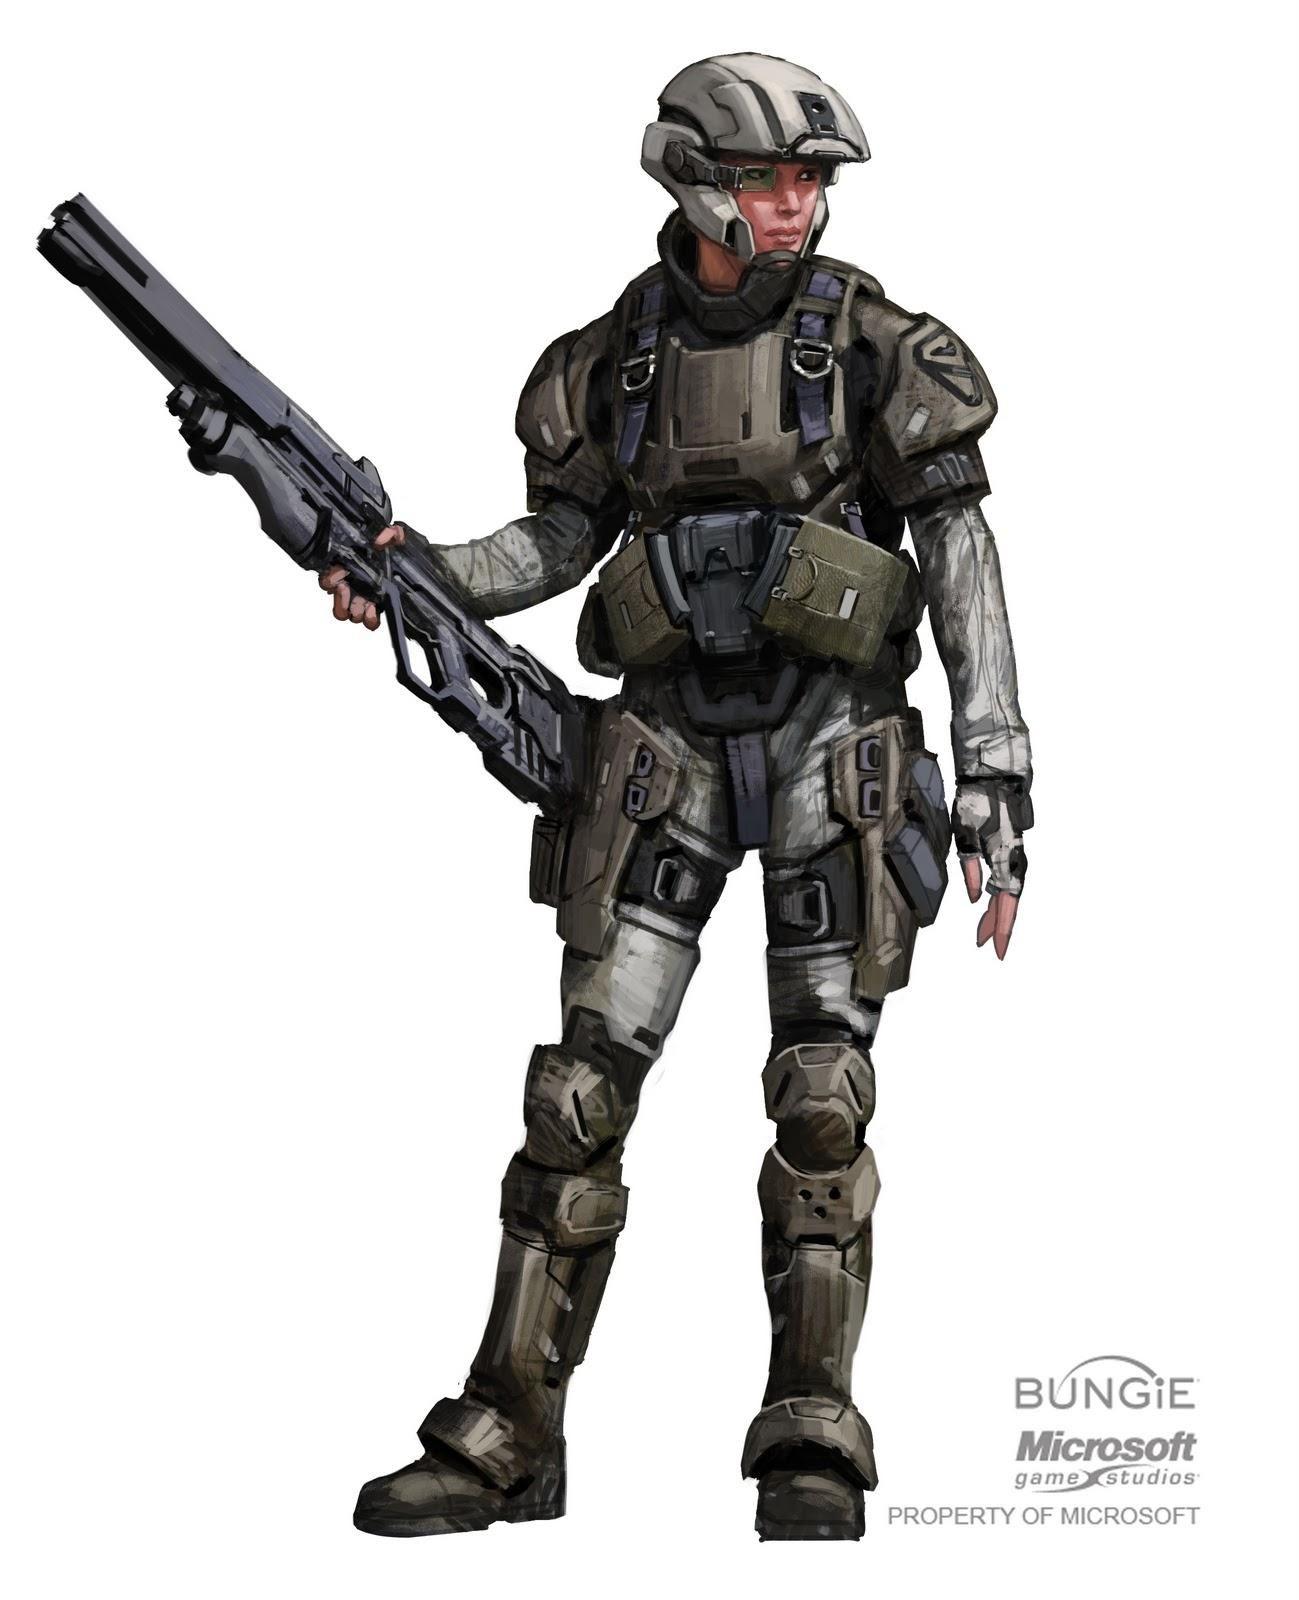 halo reach concept art   Halo armor, Sci fi characters, Halo